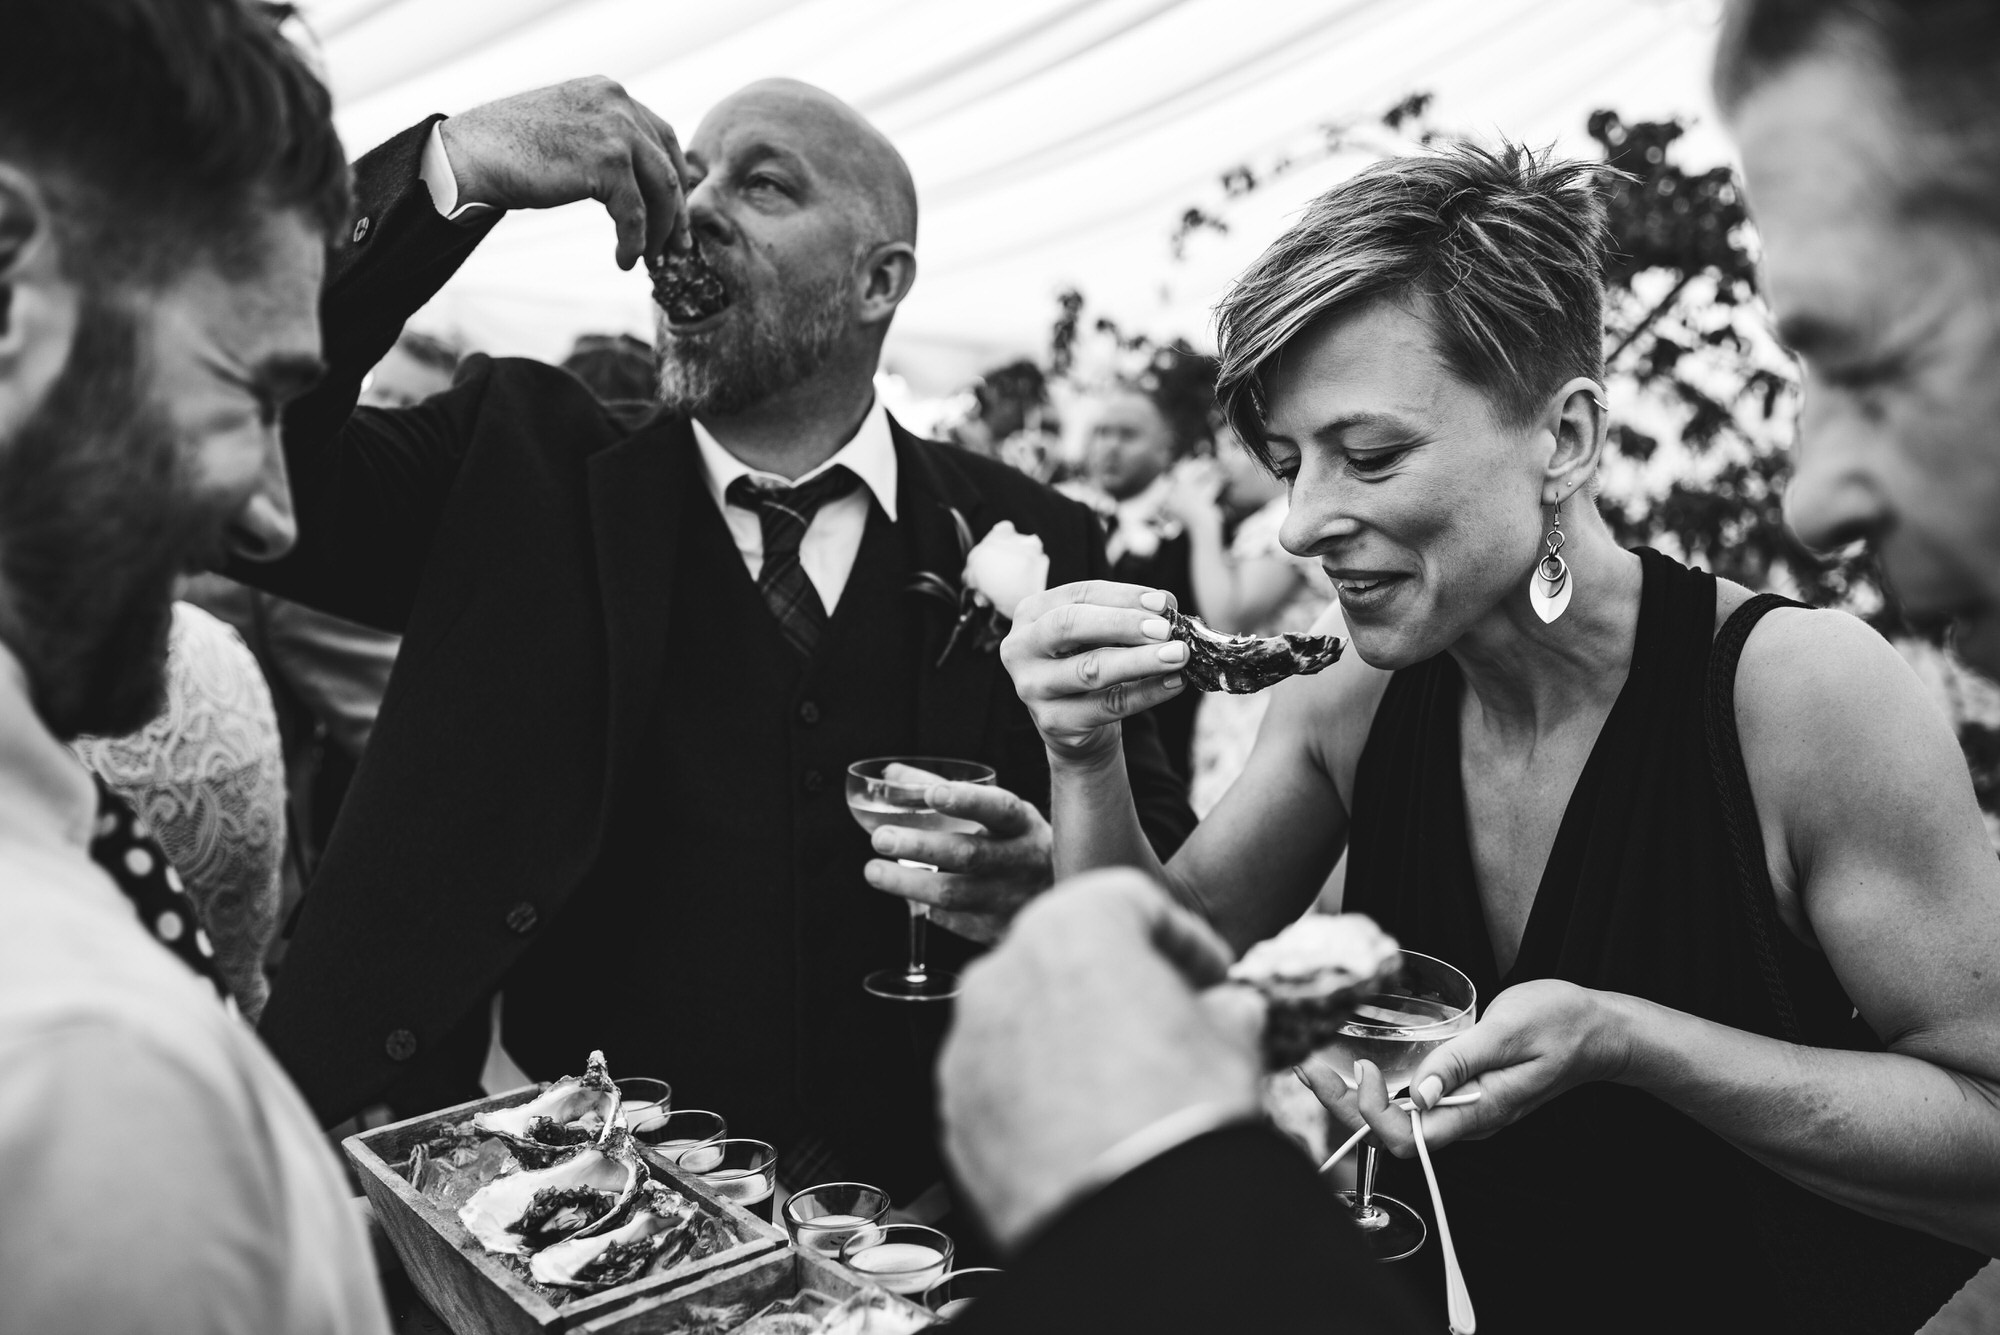 Dorset marquee wedding by the sea simon biffen photography 35